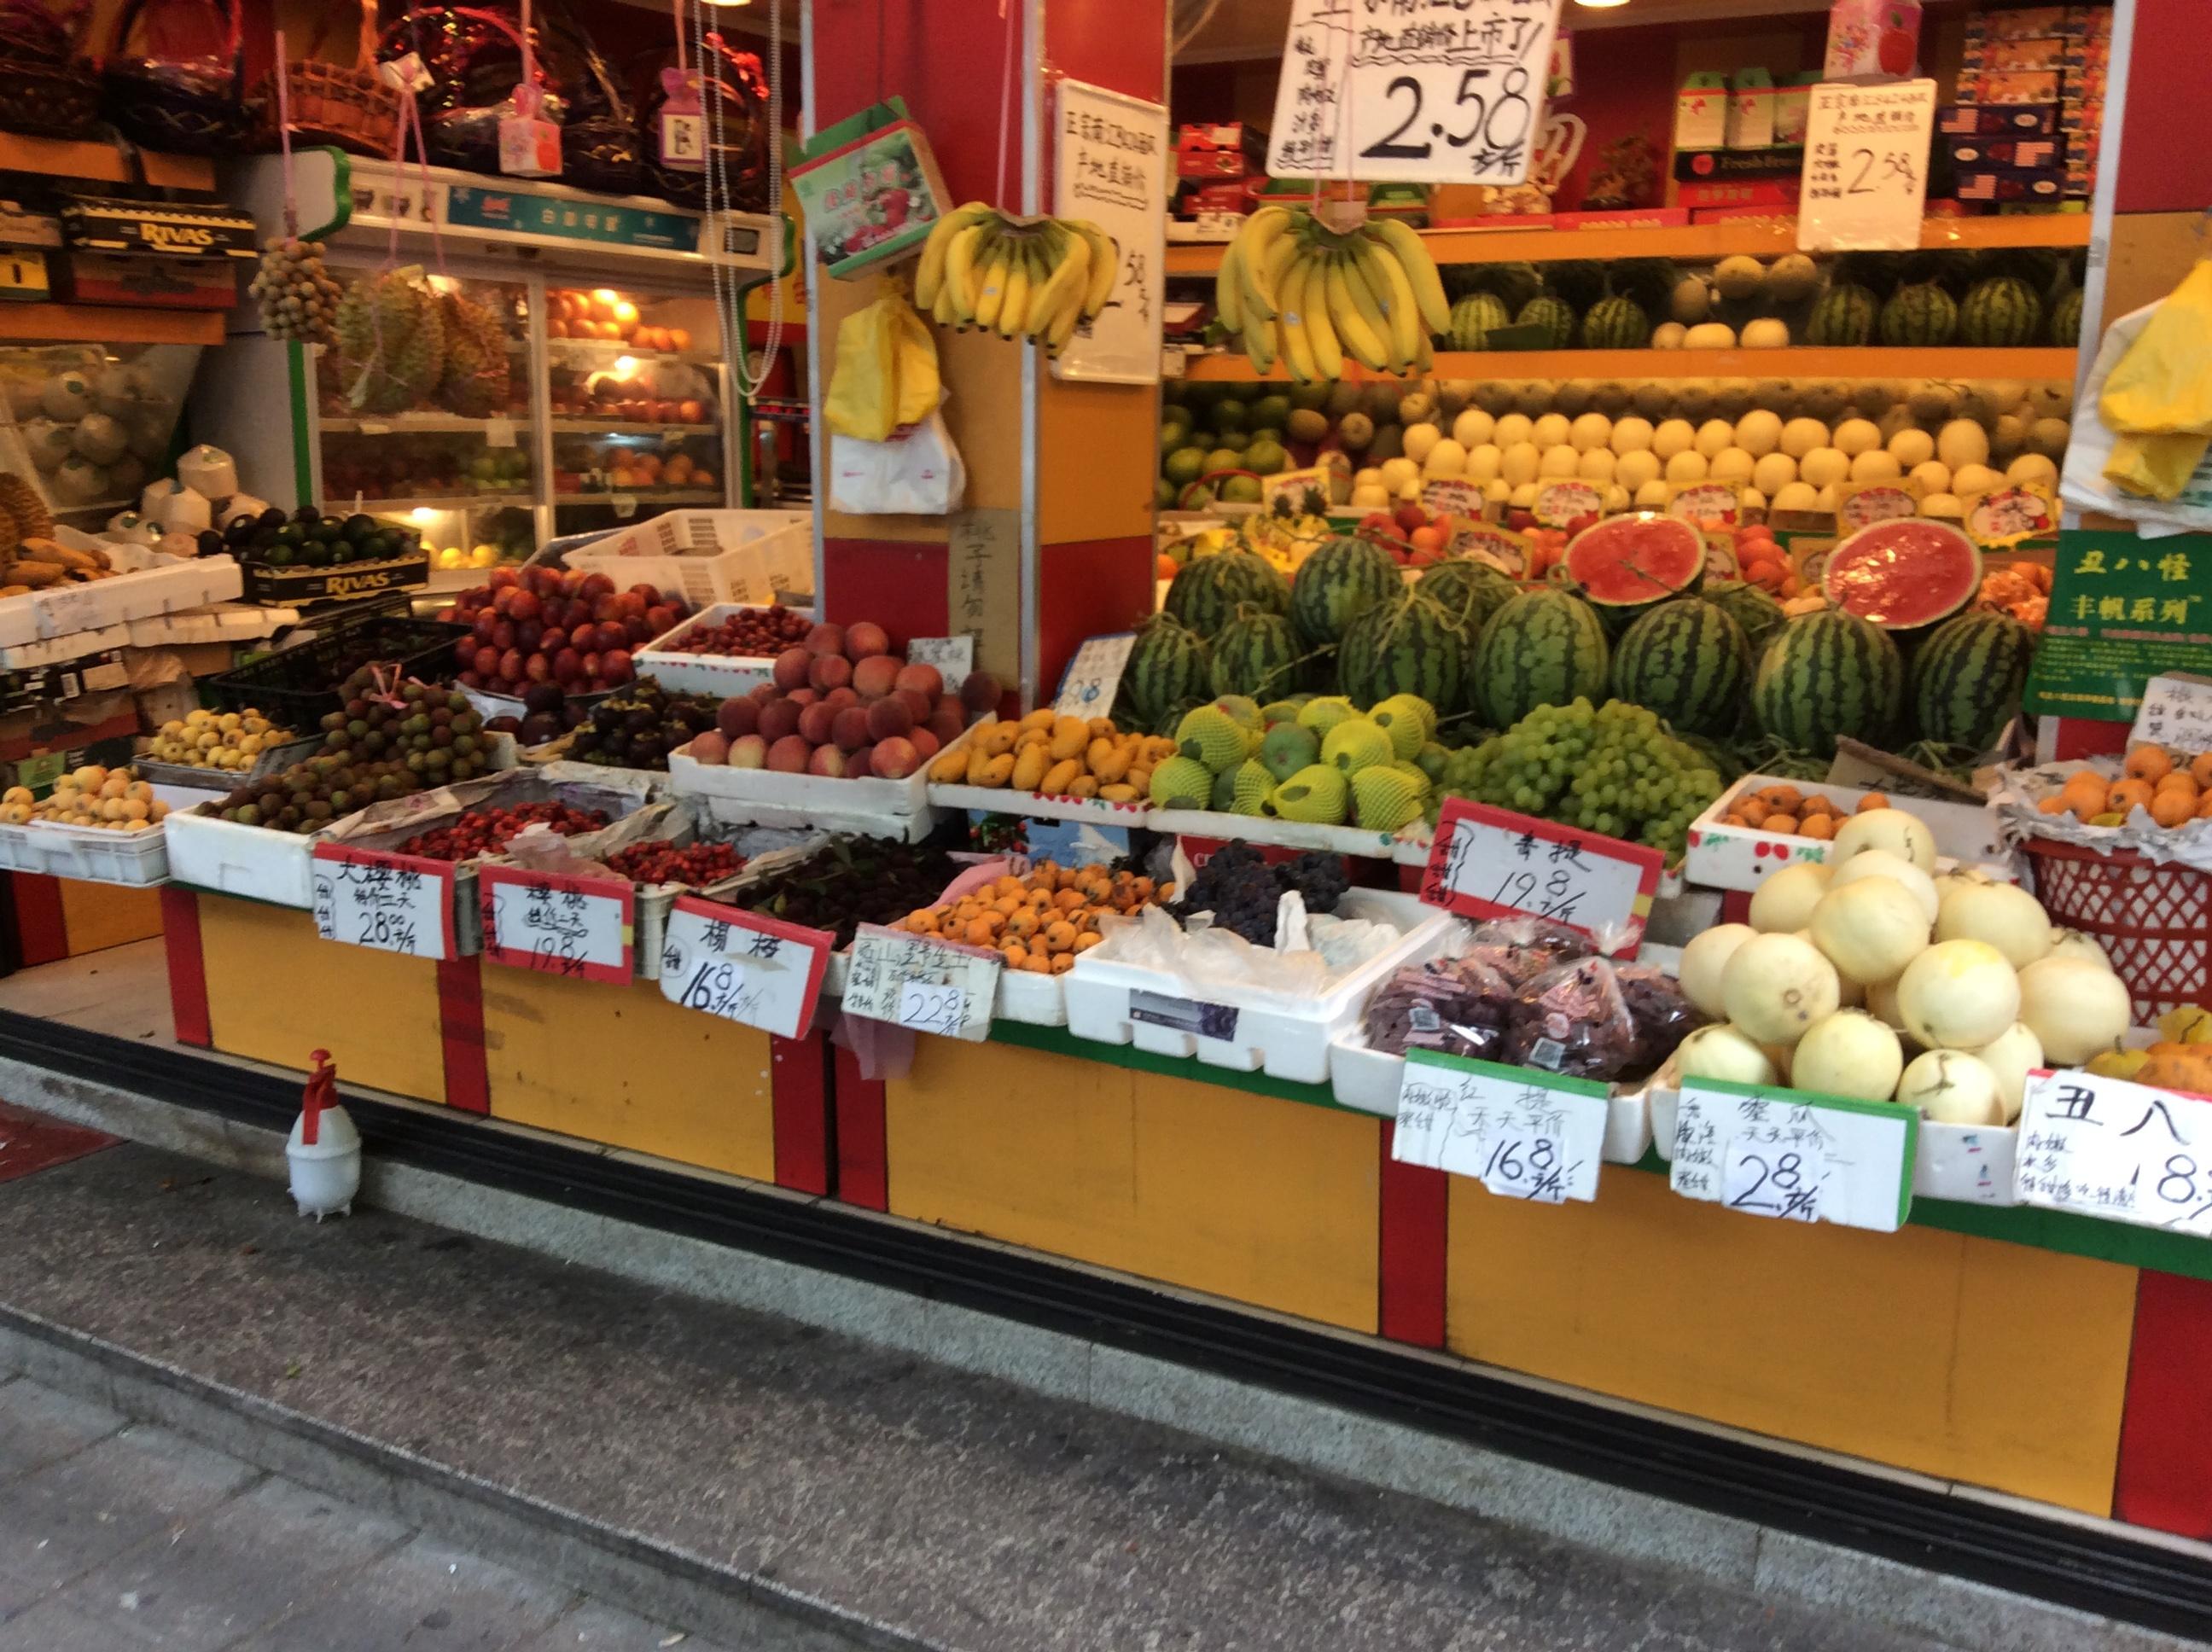 CAPAStudyAbroad_ShanghaiWalksPost_-_A_colourful_fruit_and_vegetable_store_on_Wulumqi_Lu-1.jpg